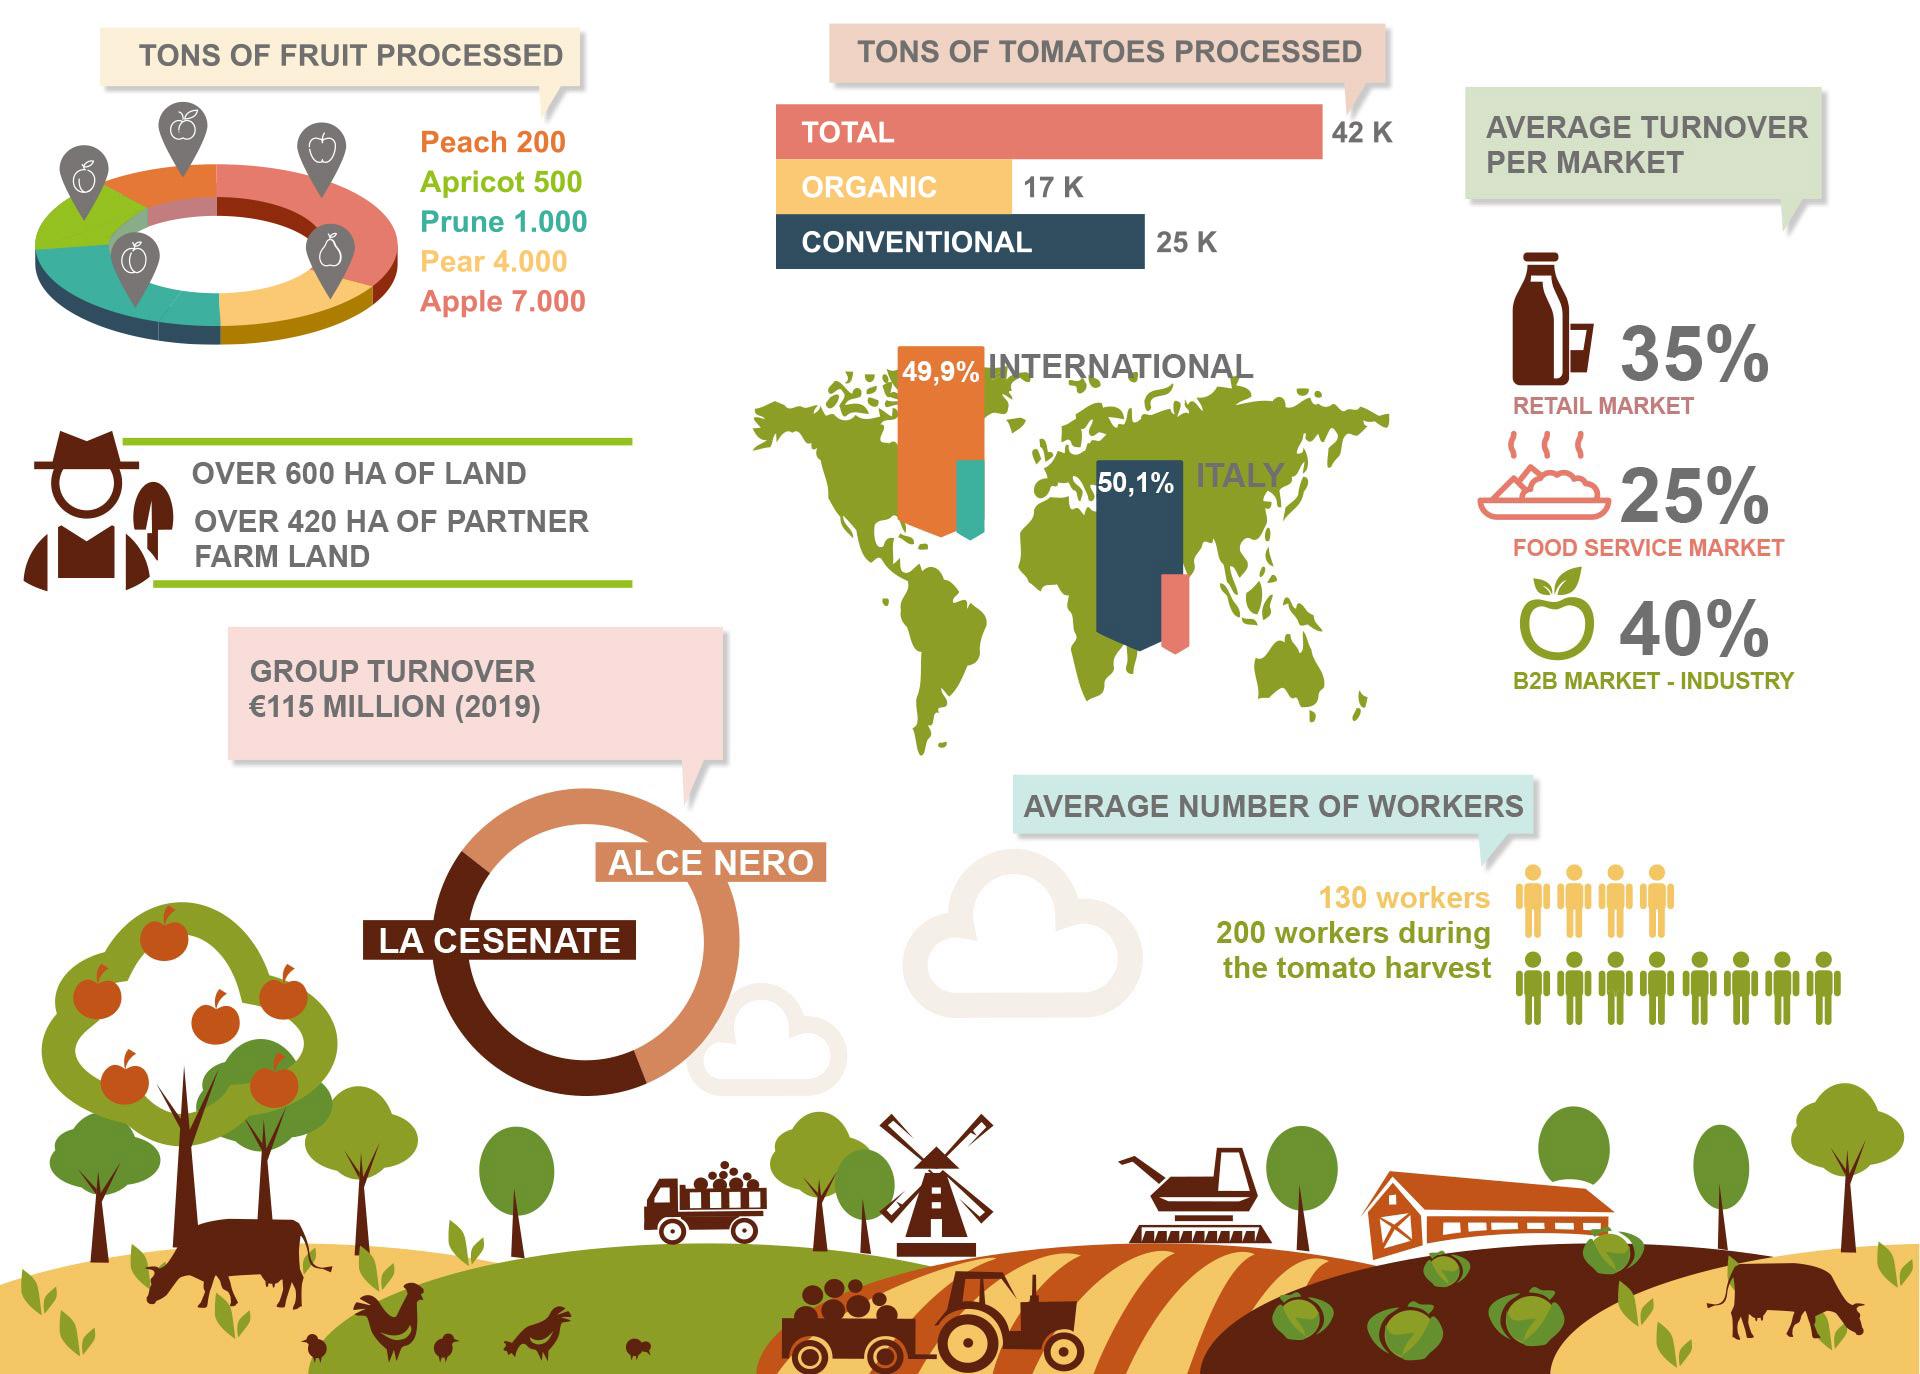 https://www.lacesenate.it/wp-content/uploads/2020/12/infografica-1.jpg